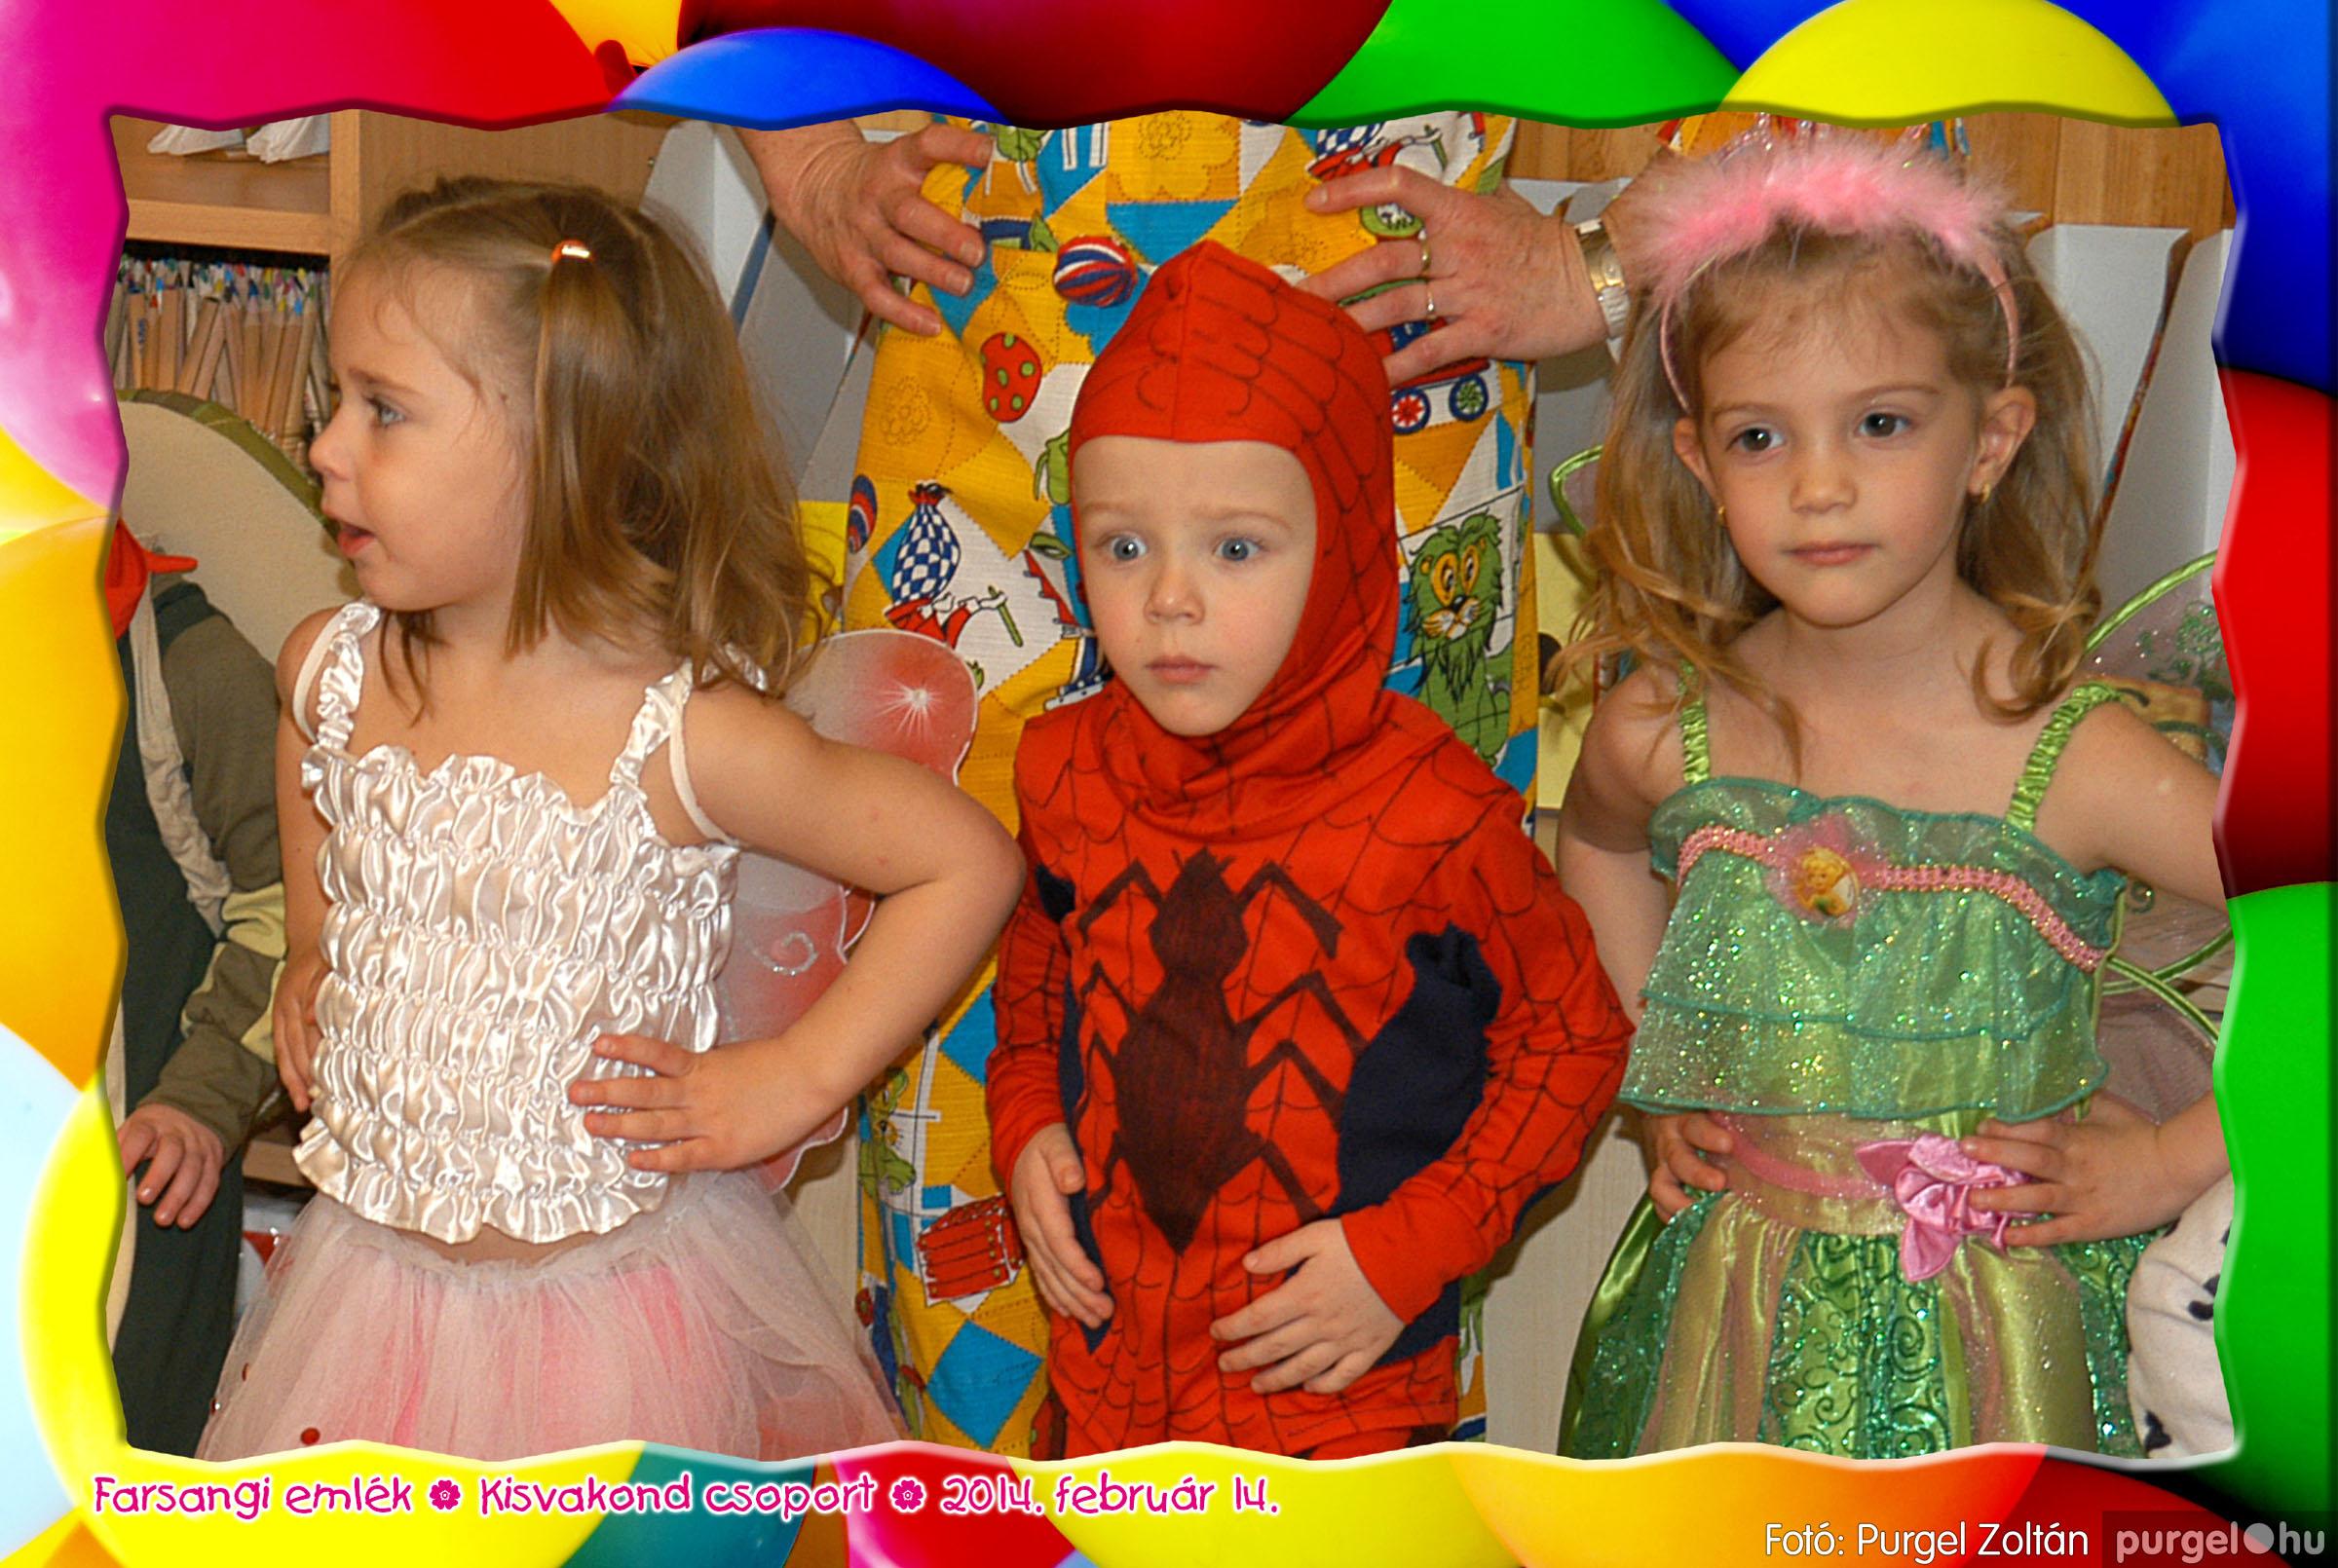 2014.02.14. 198 Kurca-parti Óvoda farsang 2014. - Kisvakond csoport - Fotó:PURGEL ZOLTÁN© 418.jpg